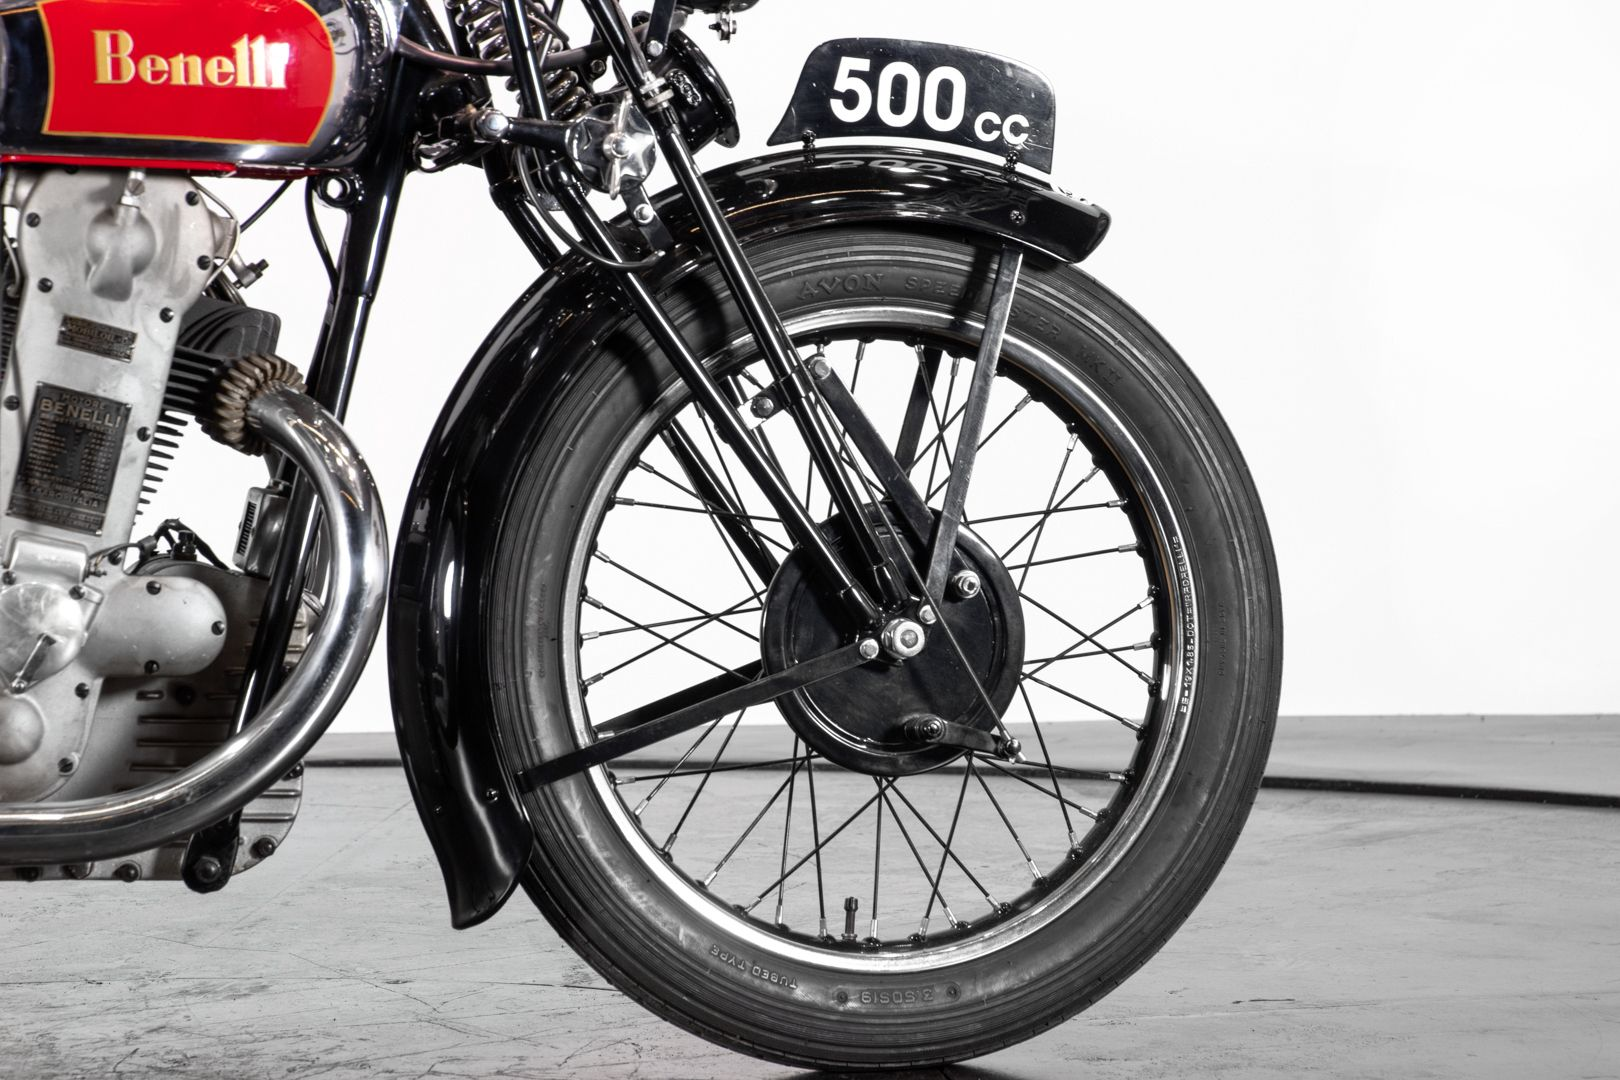 1939 Benelli 500 72504